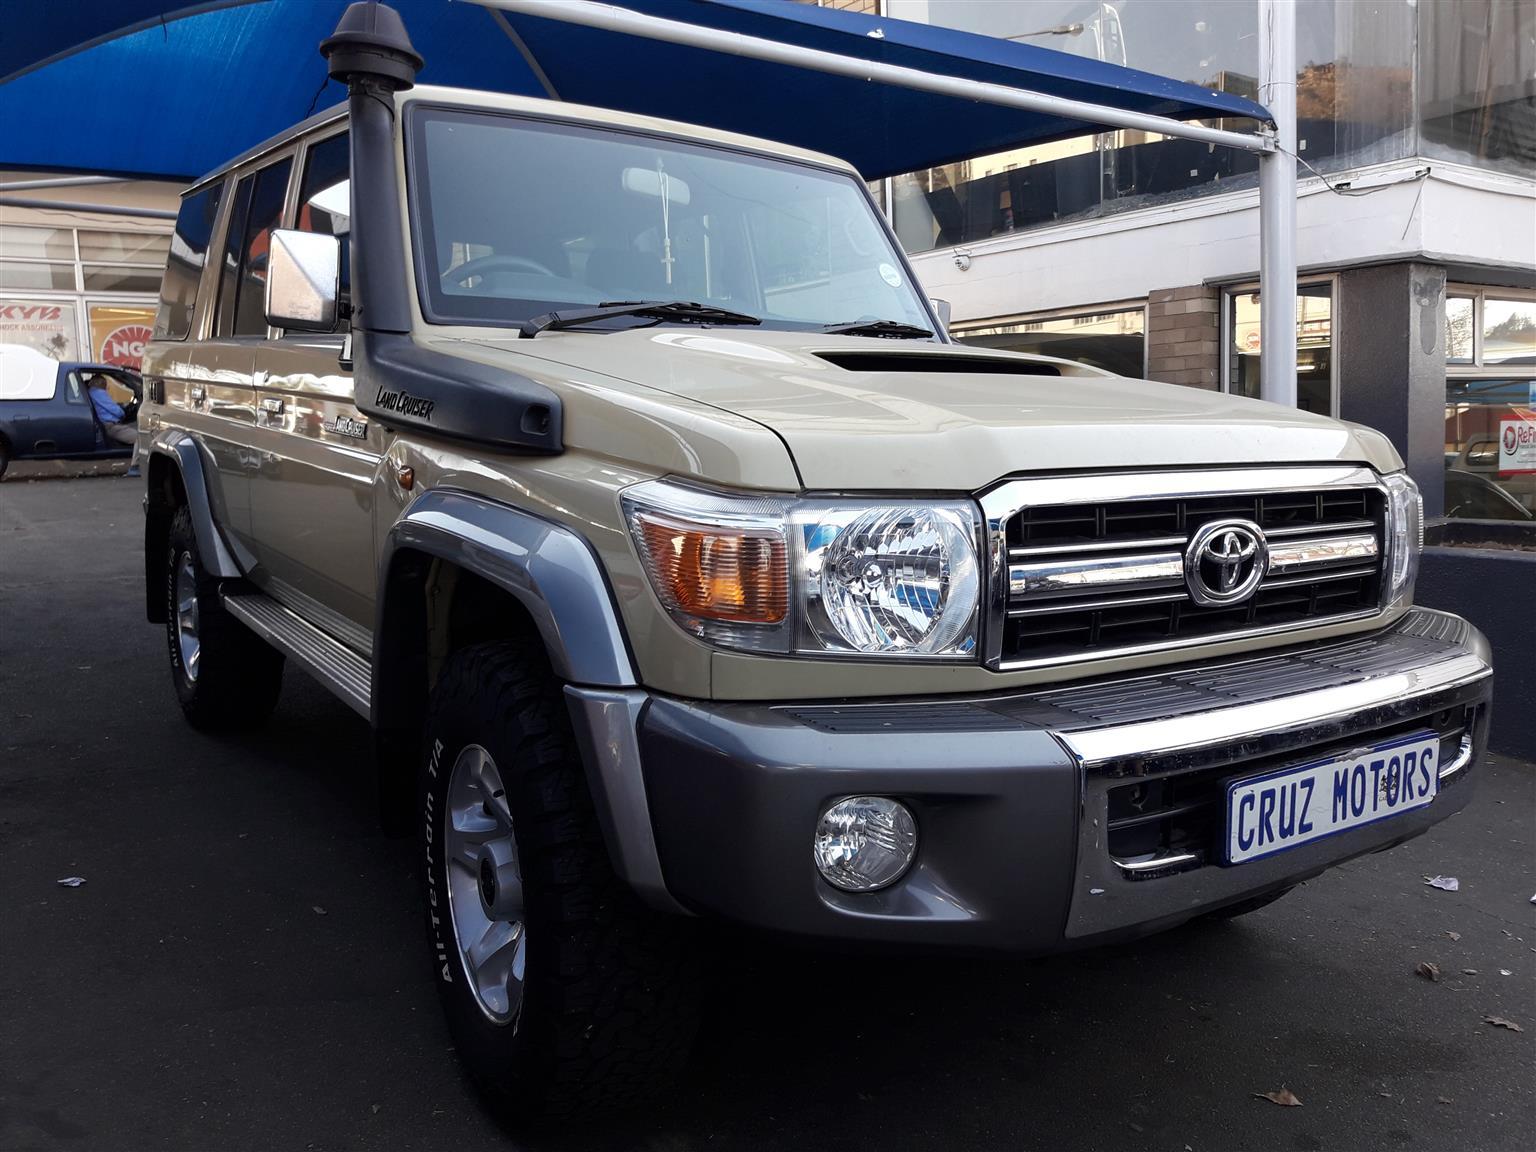 2014 Toyota Land Cruiser 100 4.5 GX   Junk Mail